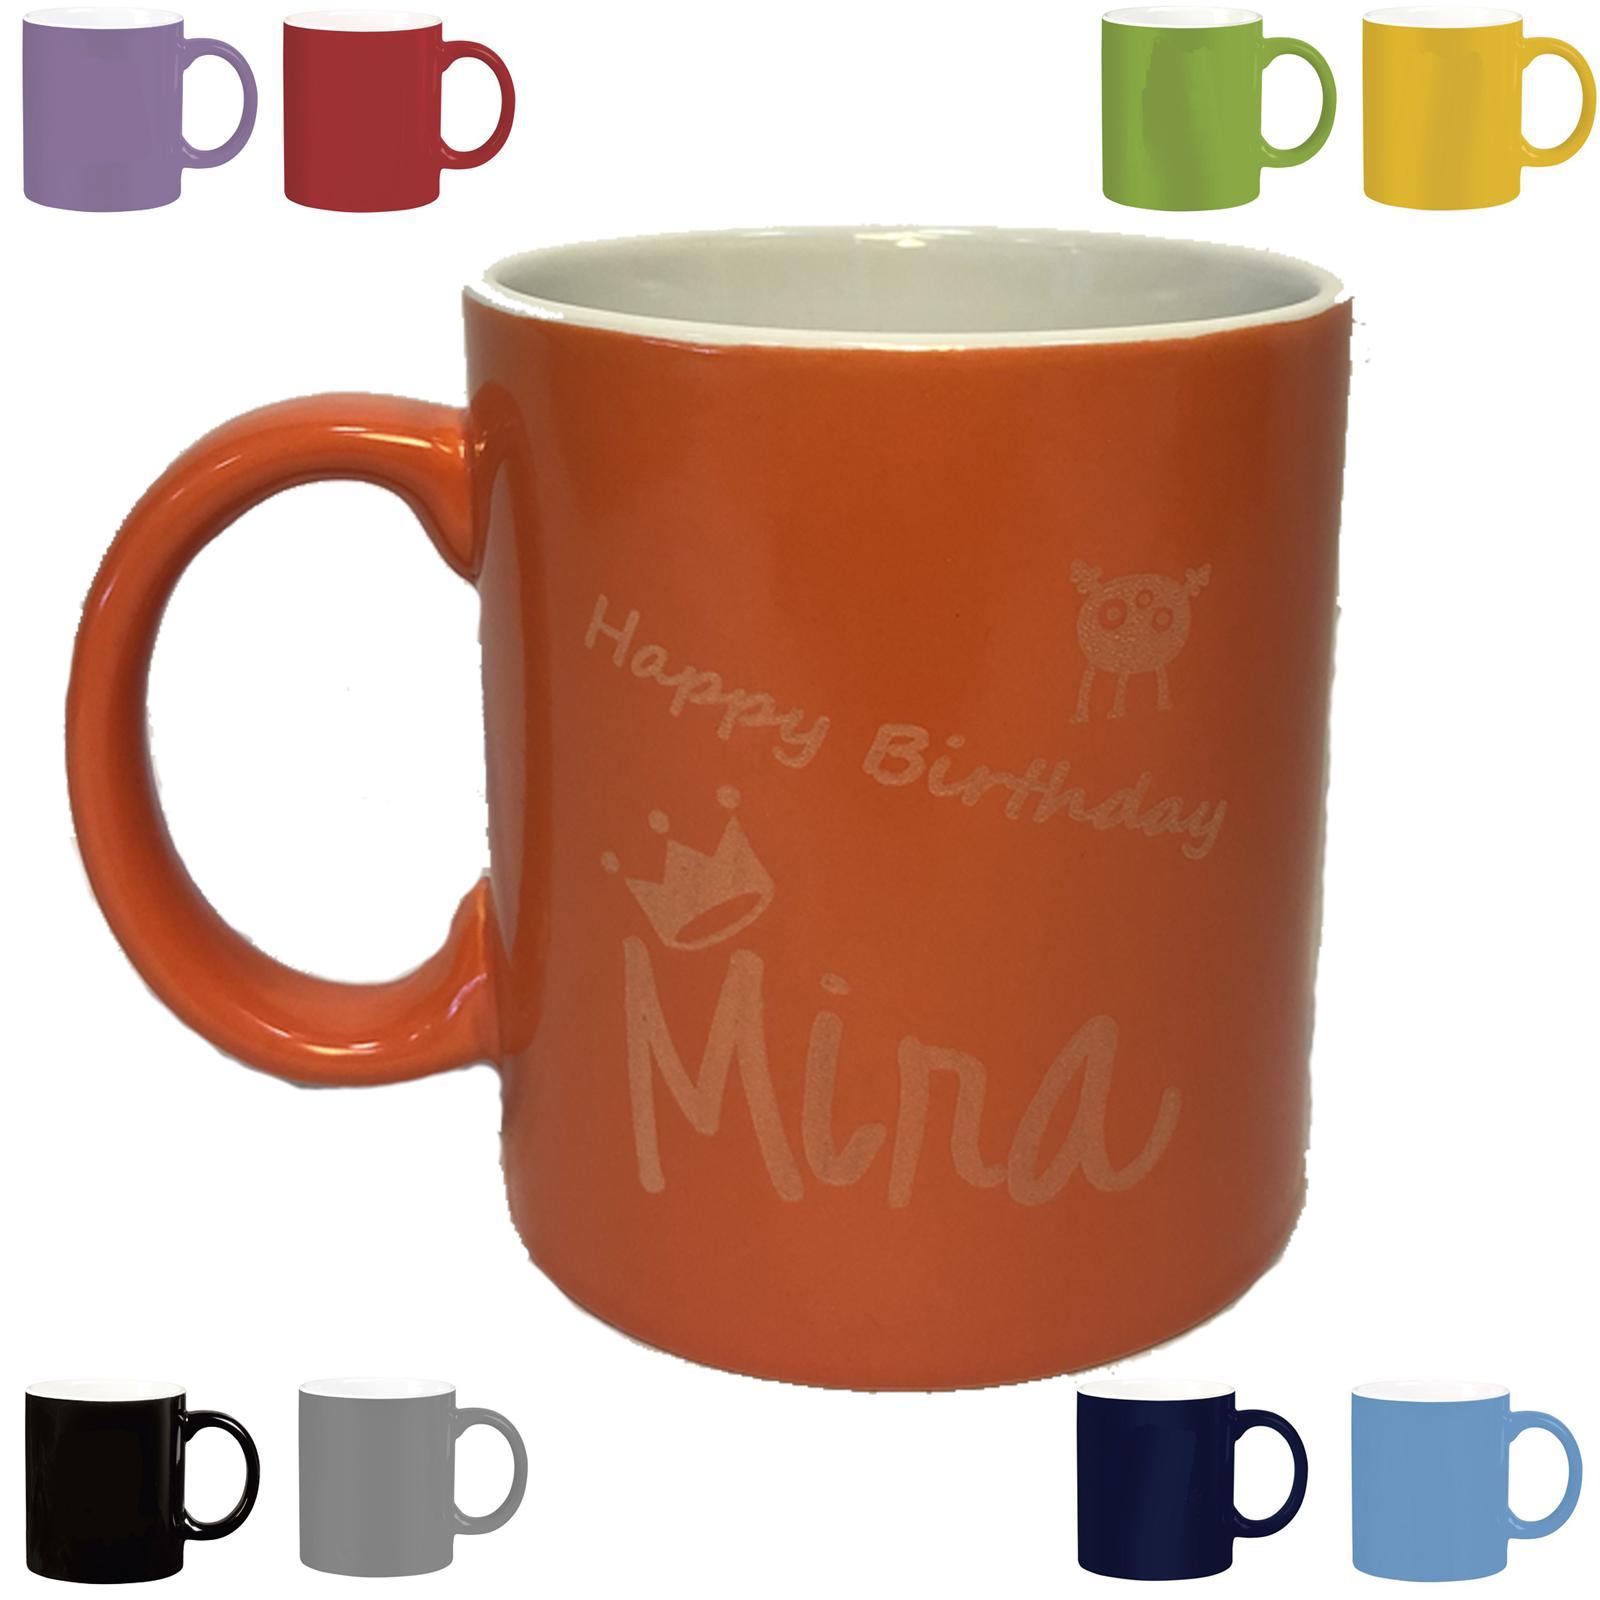 Keramikbecher Becher Kaffeebecher personalisiert mit Gravur Tasse